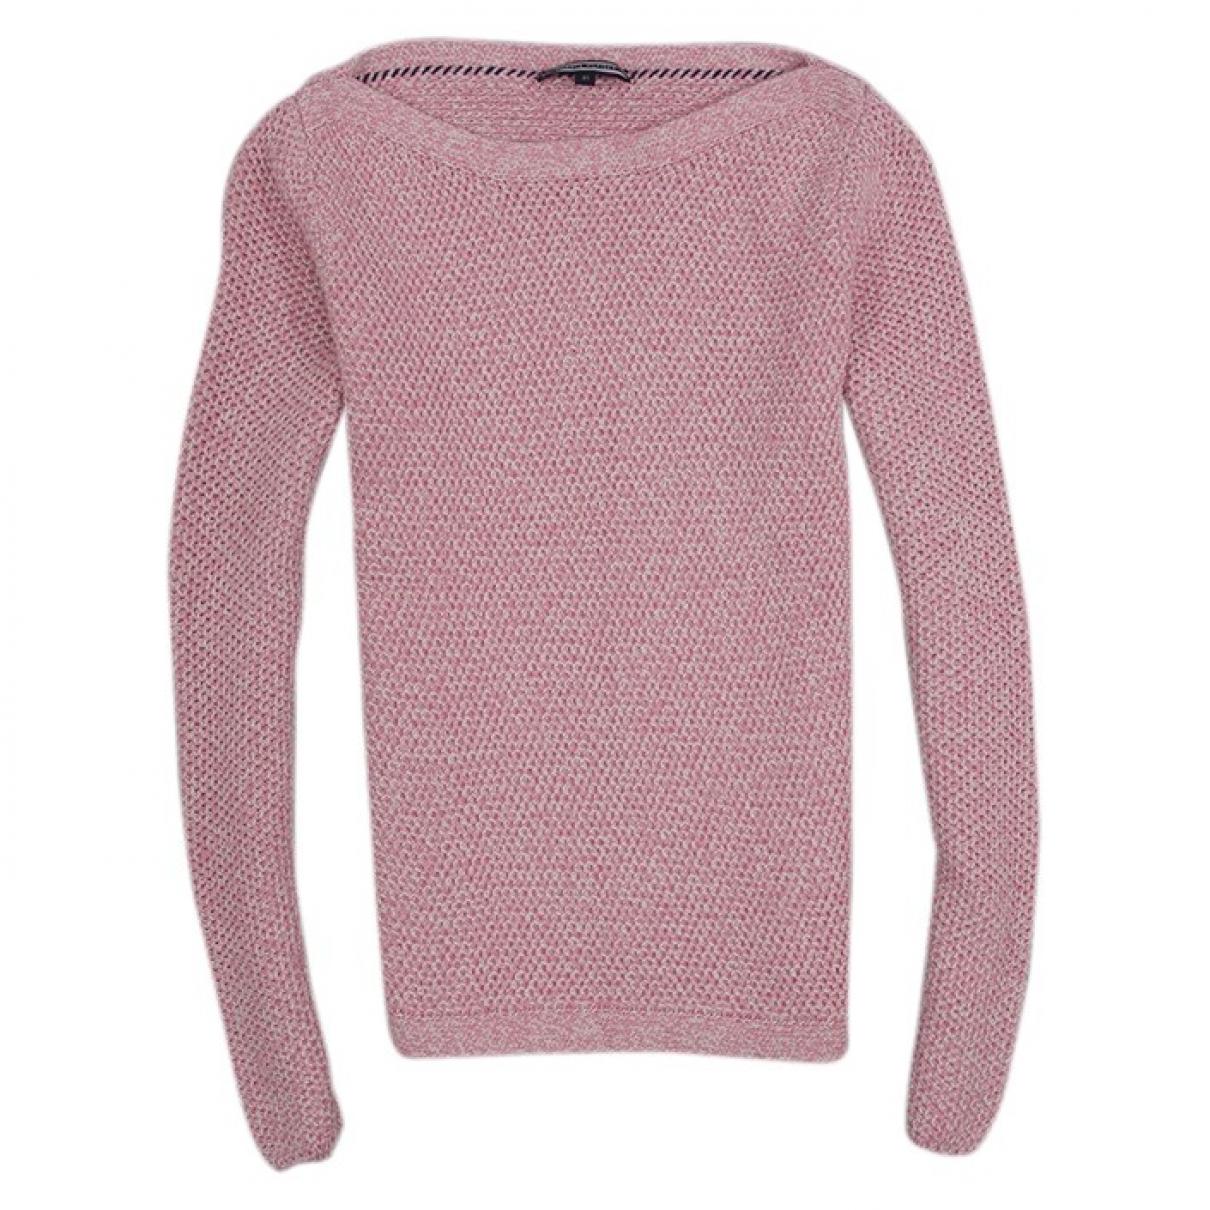 Tommy Hilfiger \N Pink Cotton Knitwear for Women XS International